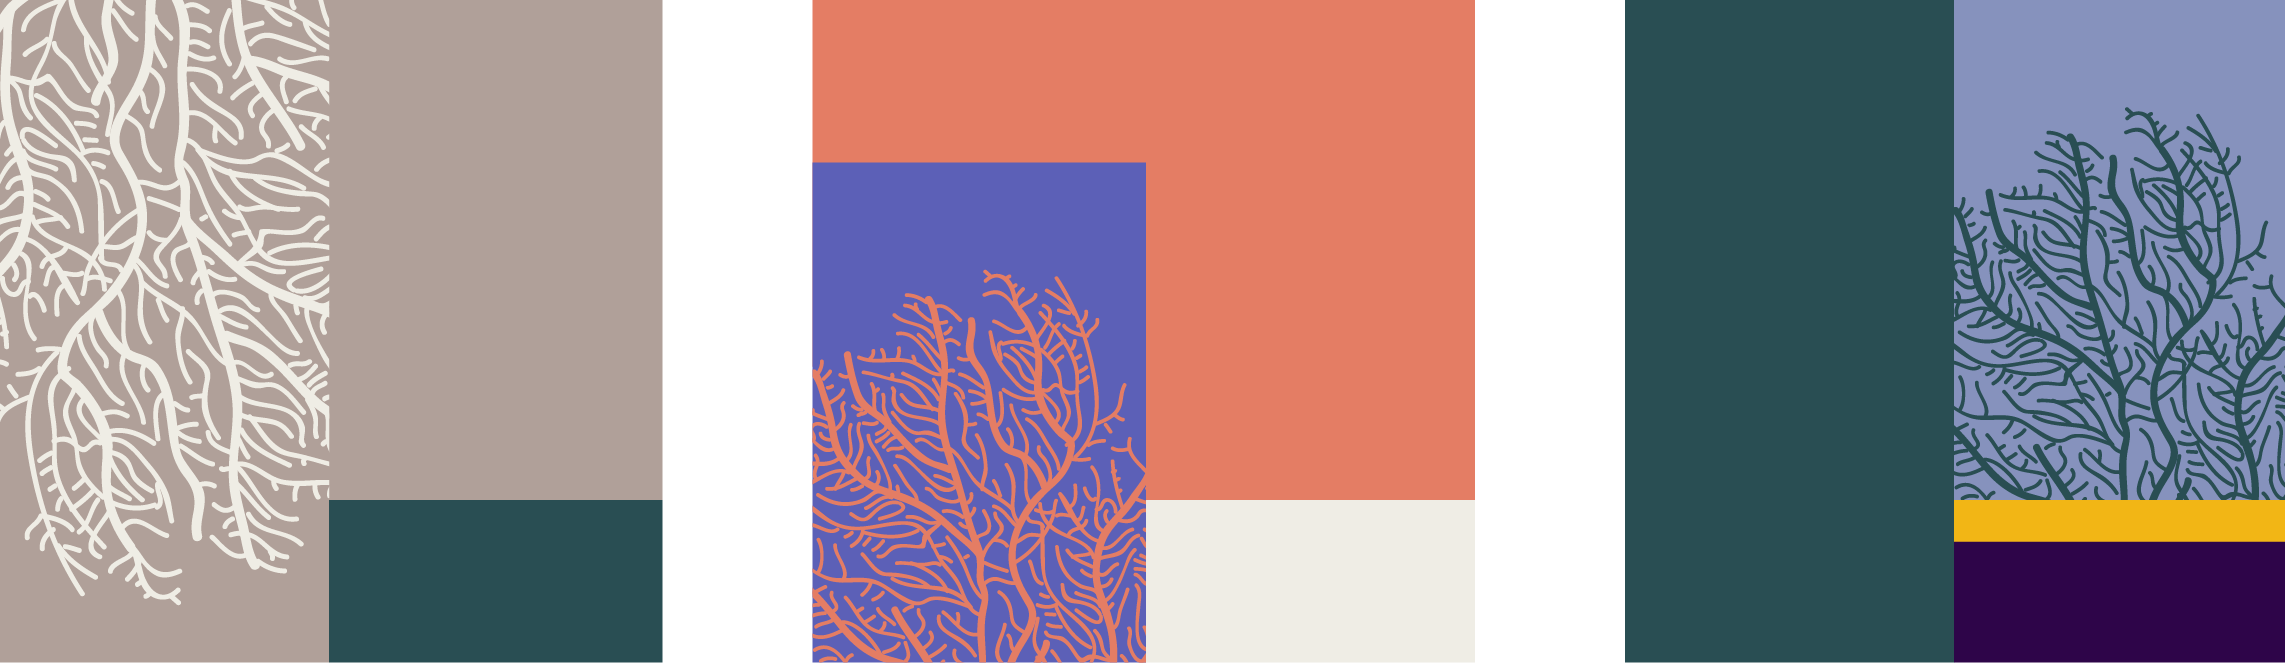 color/pattern blocks